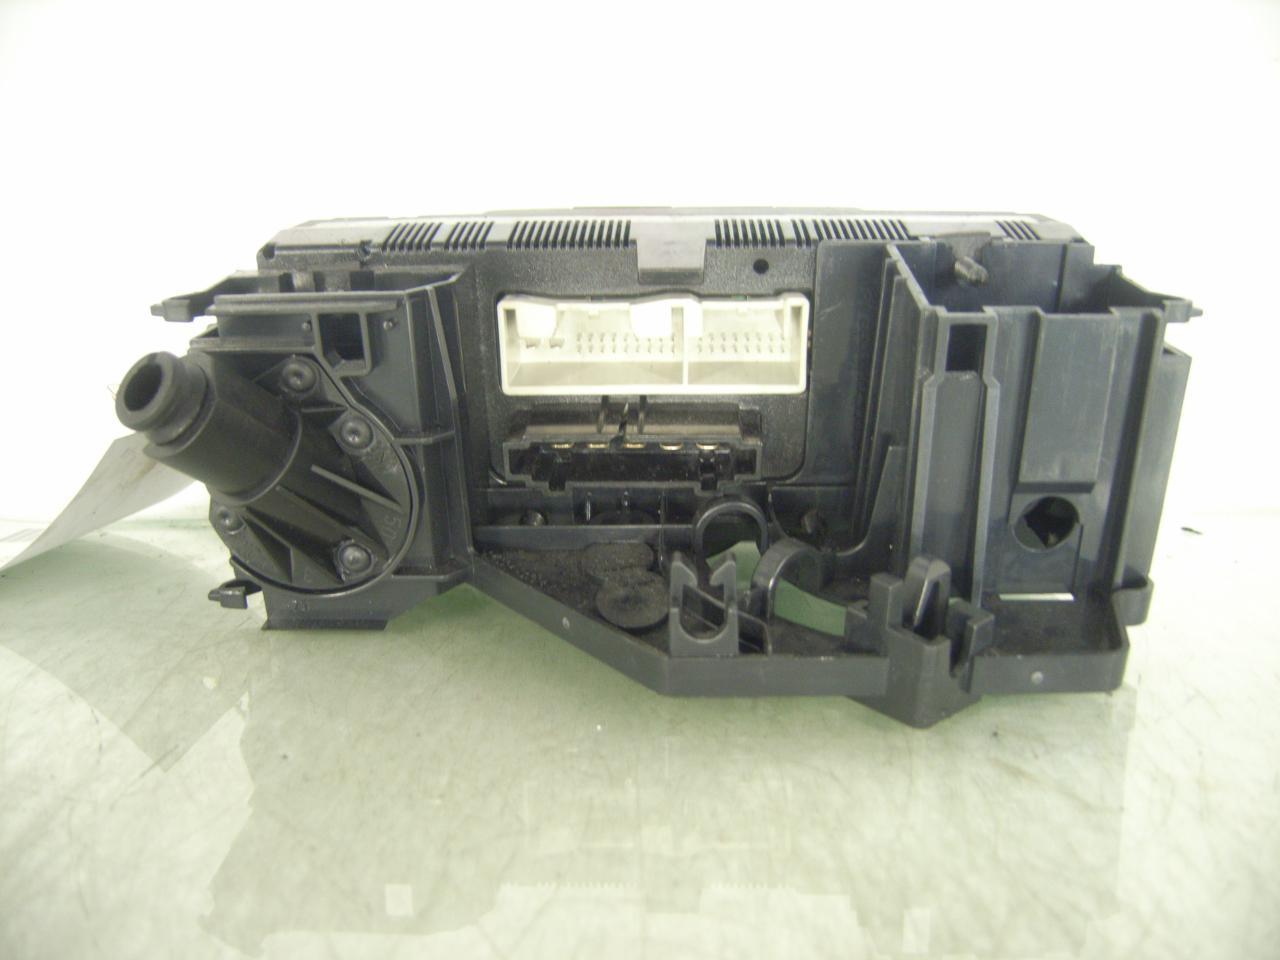 Heizungsregler aus VW PASSAT (3C2)